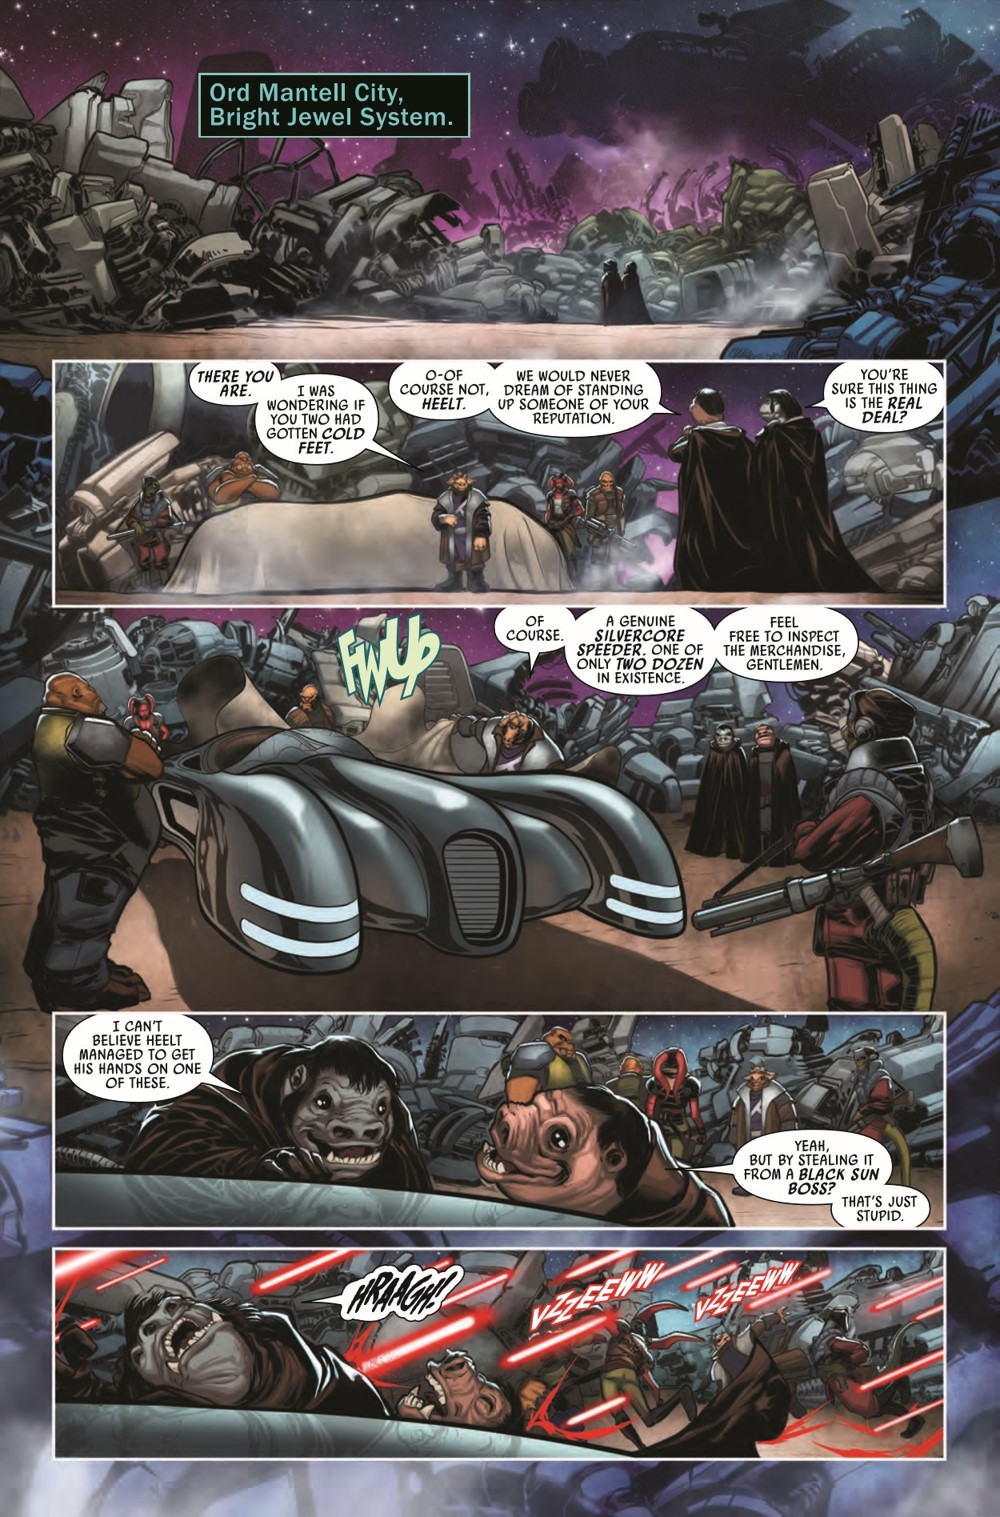 STWWAROTBHBOUSHH2021001_Preview-3 ComicList Previews: STAR WARS WAR OF THE BOUNTY HUNTERS BOUSHH #1